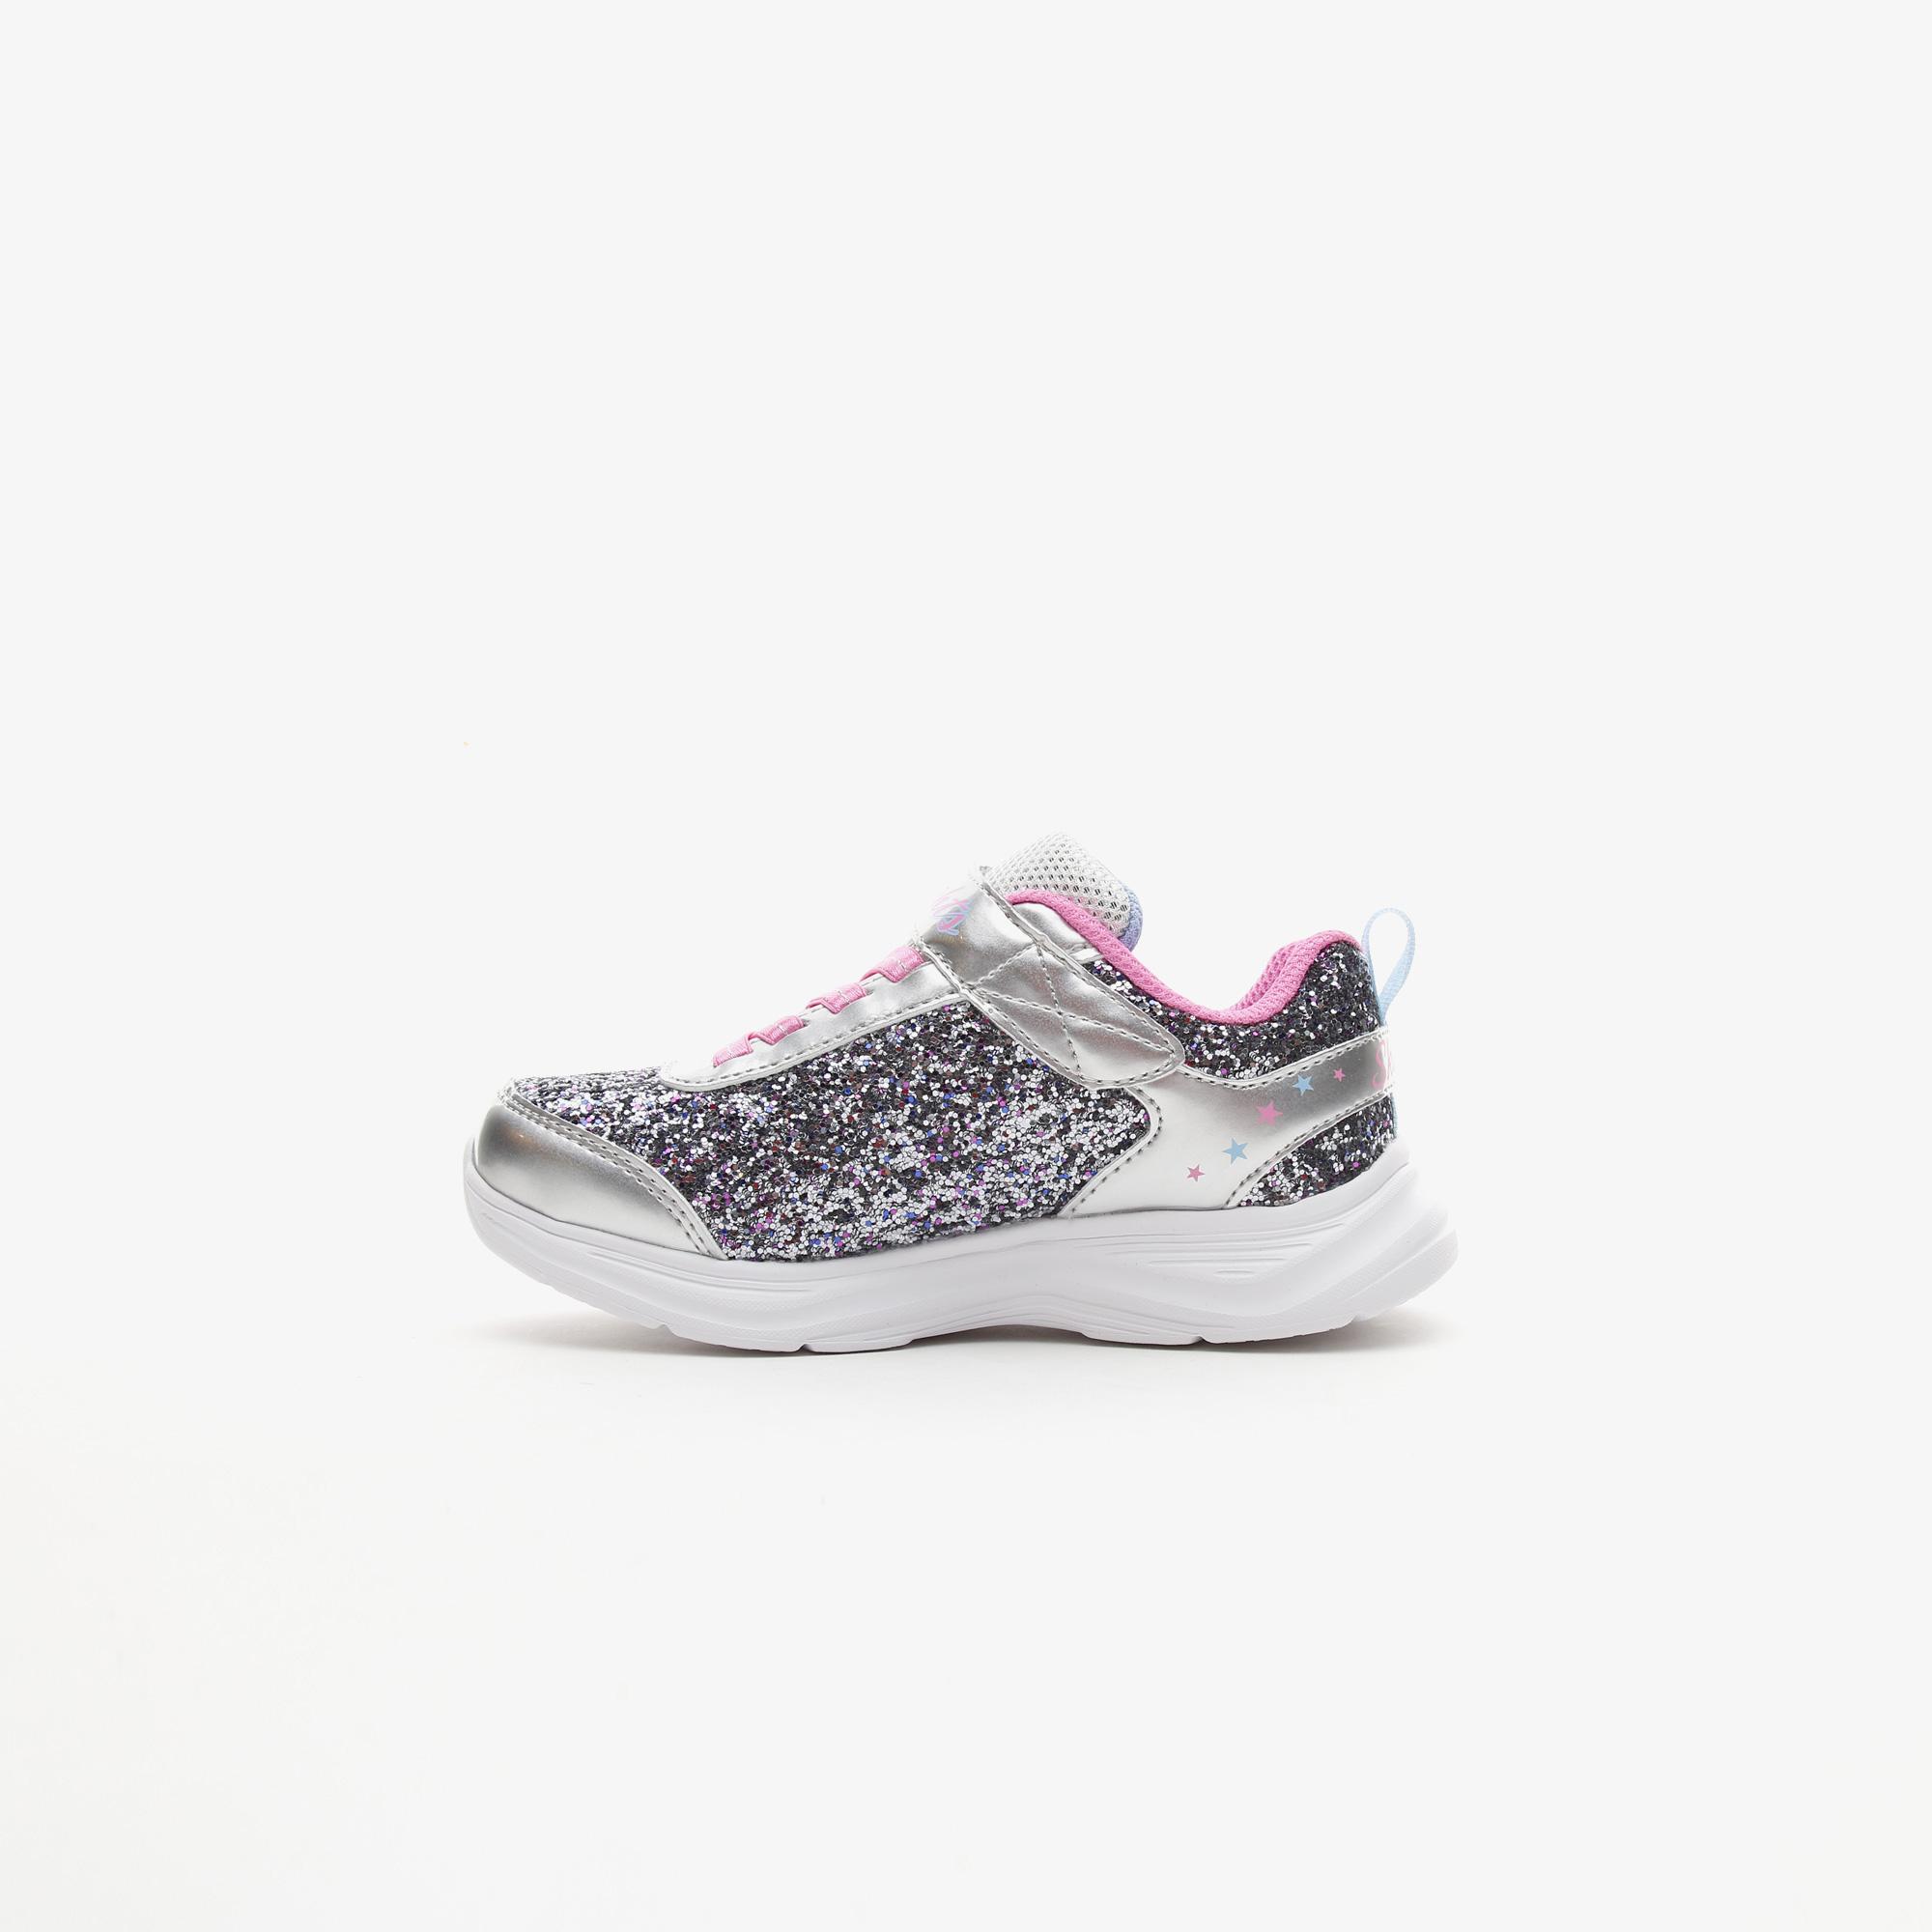 Skechers Glimmer Kicks - Starlet Shine Çocuk Gri Spor Ayakkabı